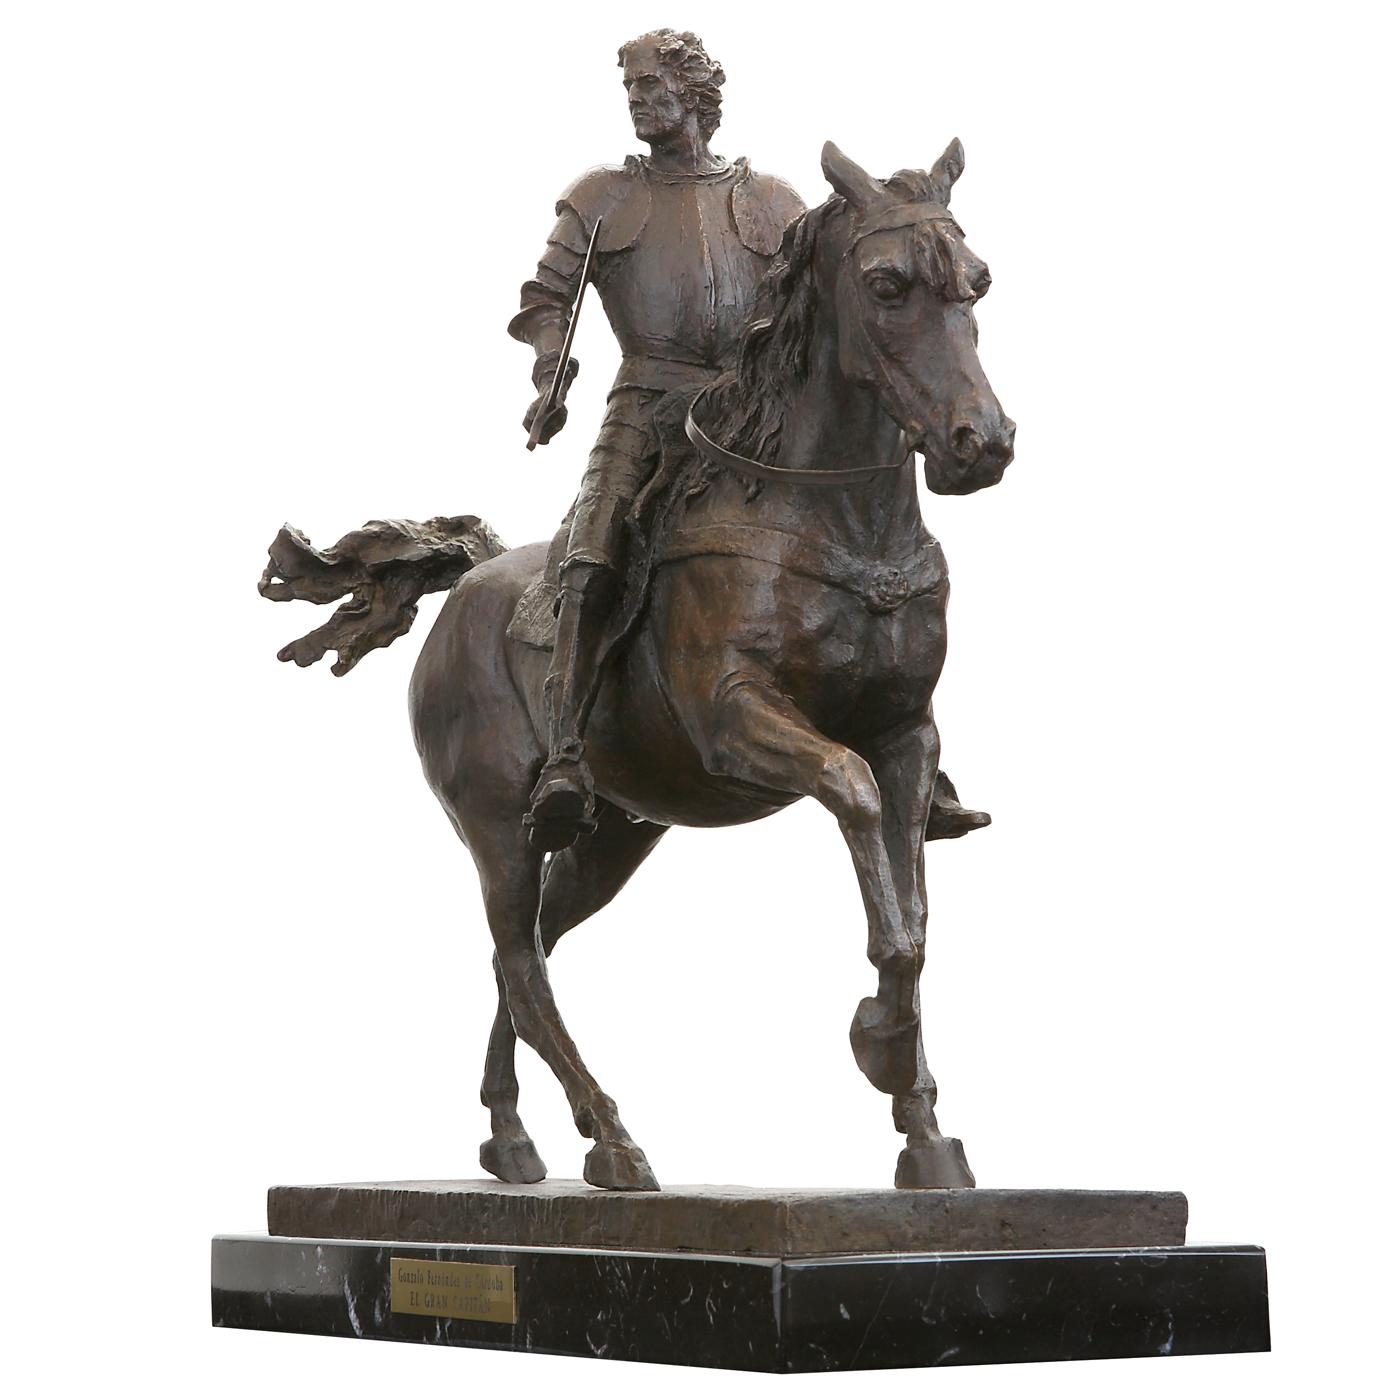 El Gran Capitán Escultura historica Madrid